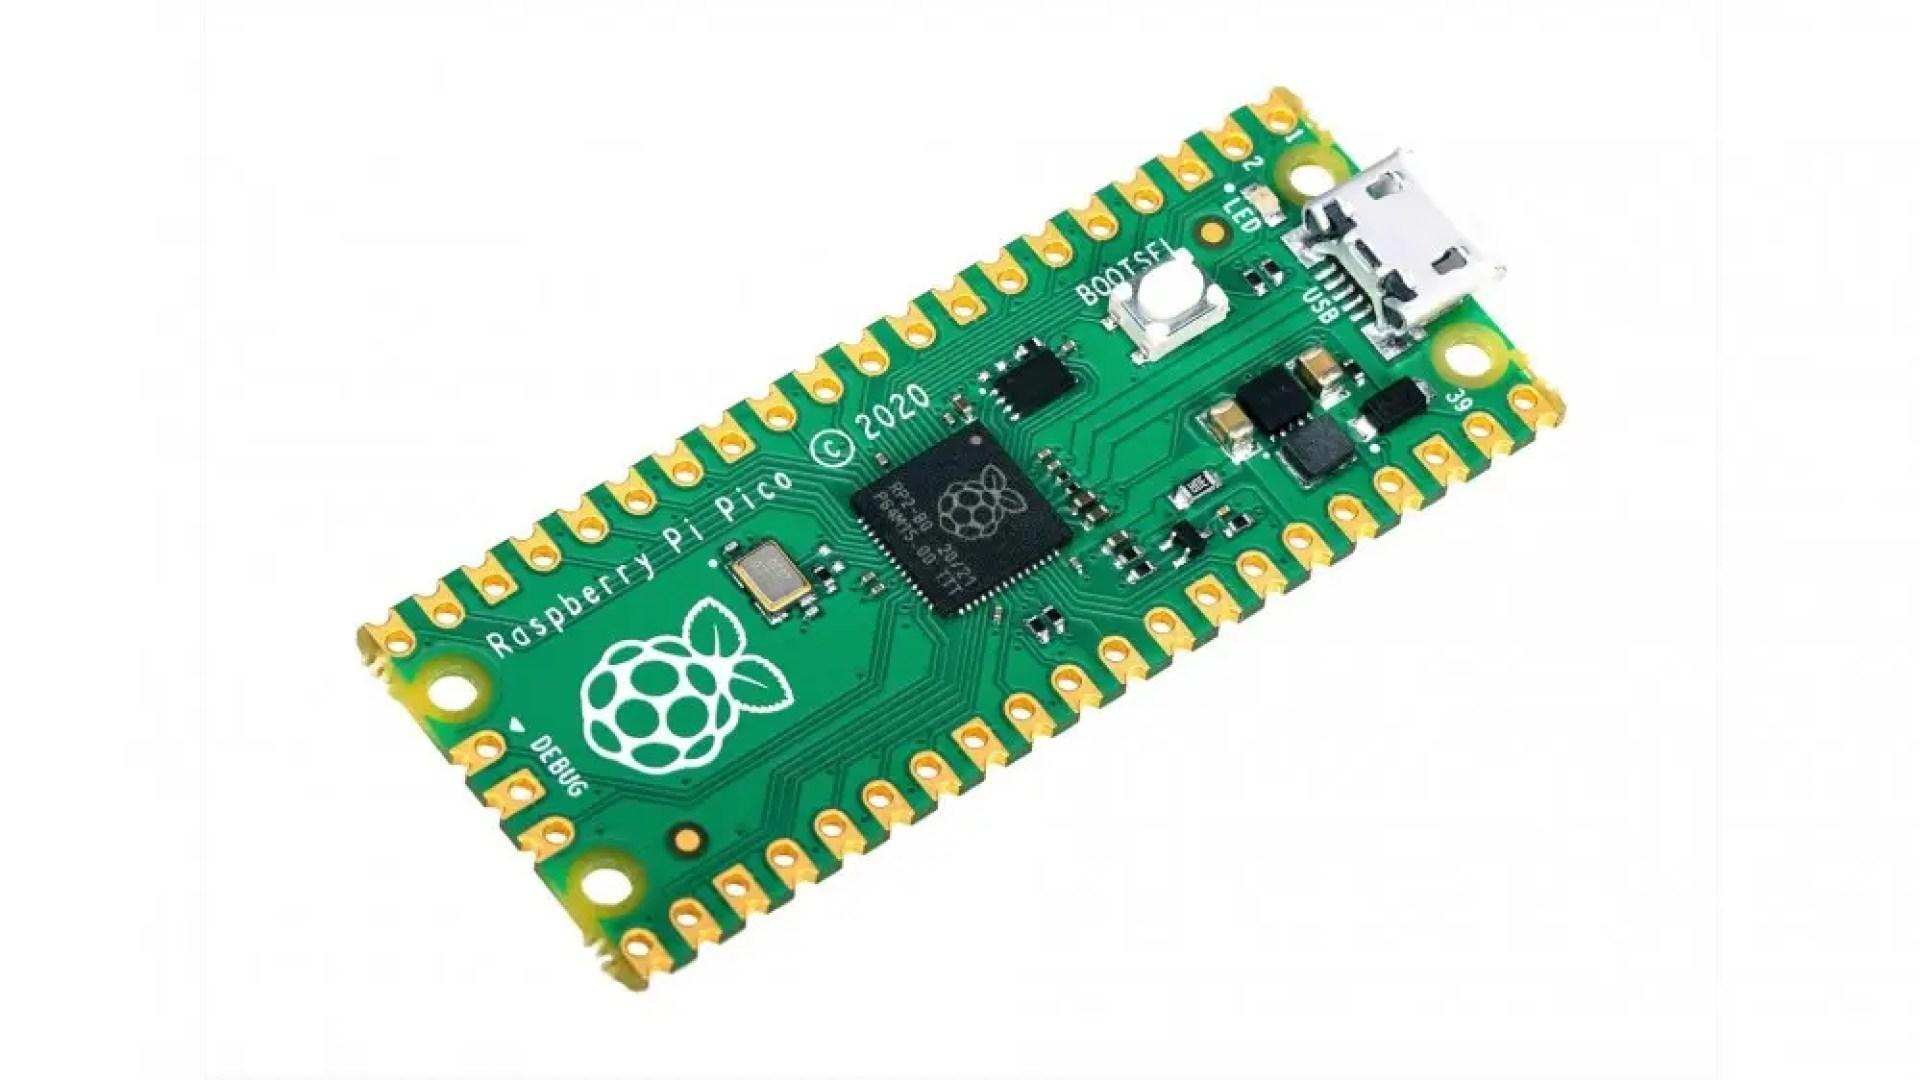 A Raspberry Pi Pico against a white background.